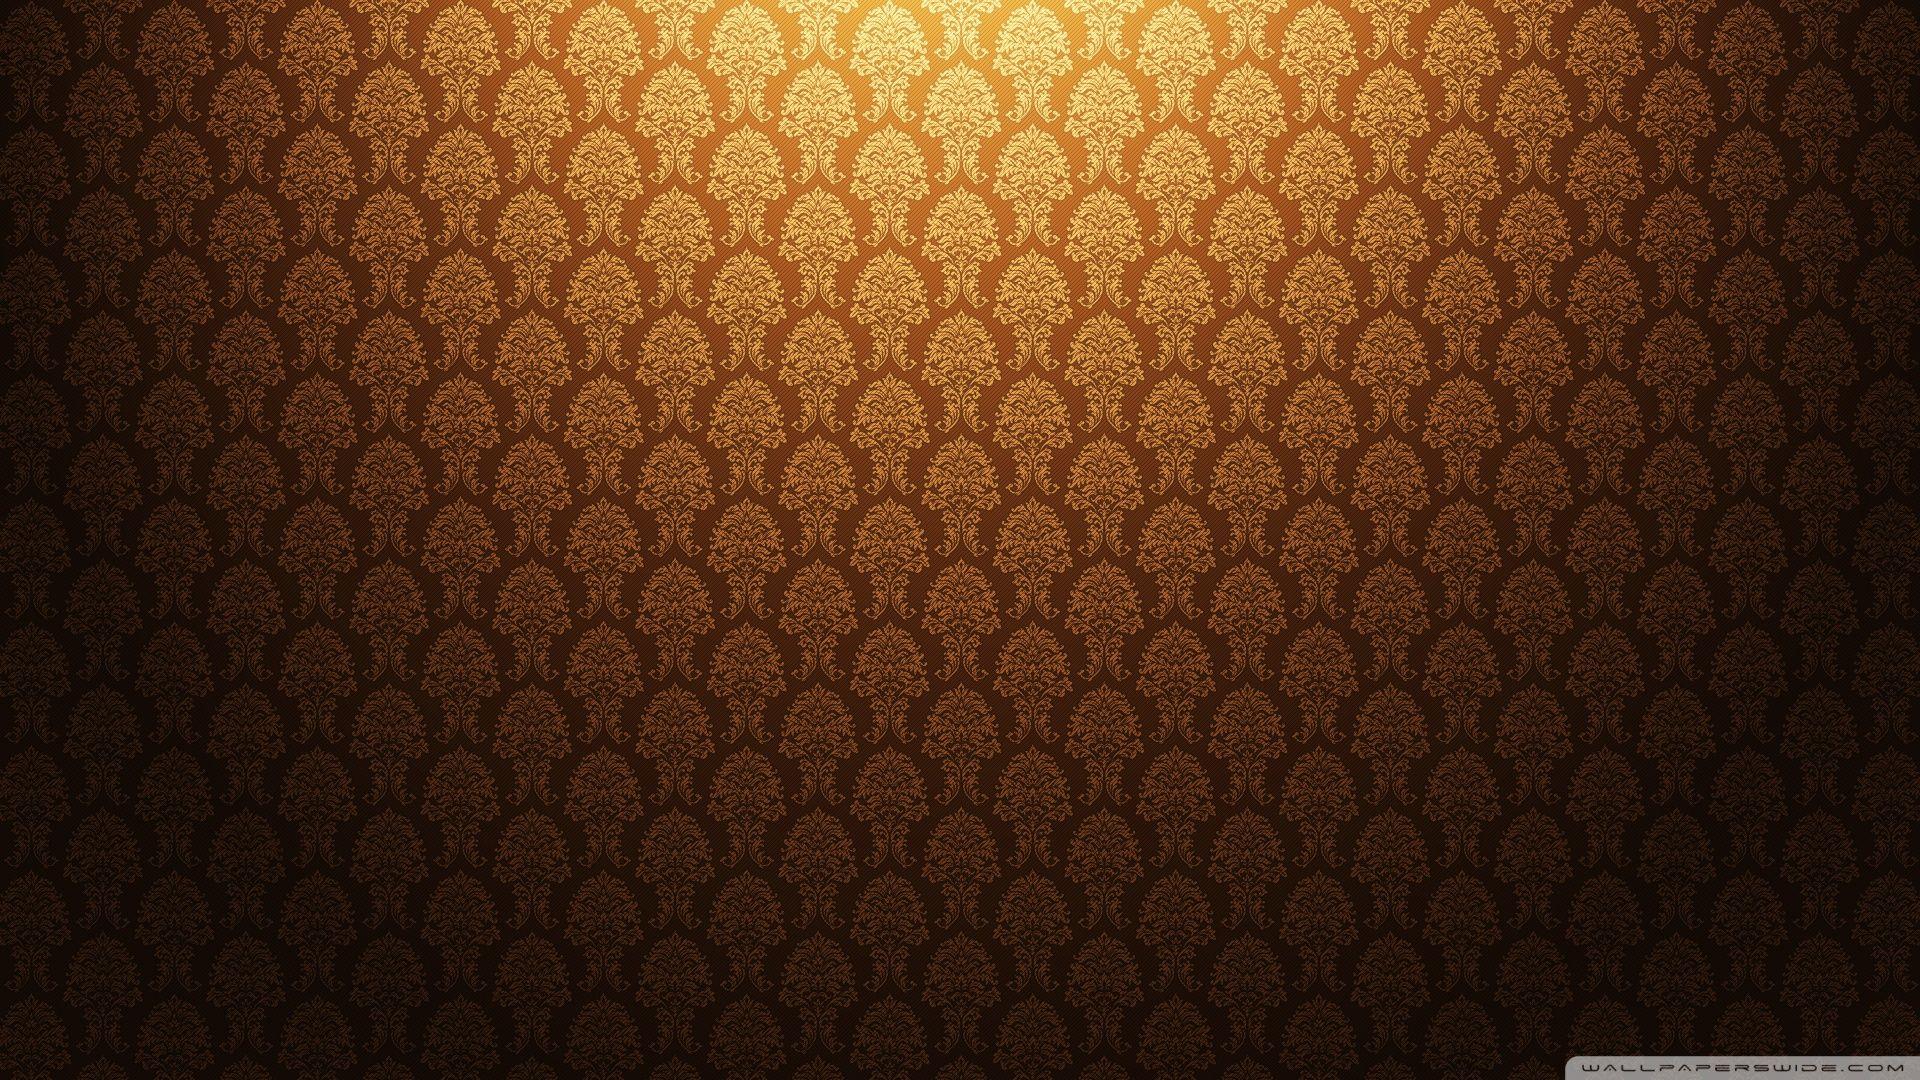 Vintage Gold Wallpaper Hd Desktop Wallpaper High Definition